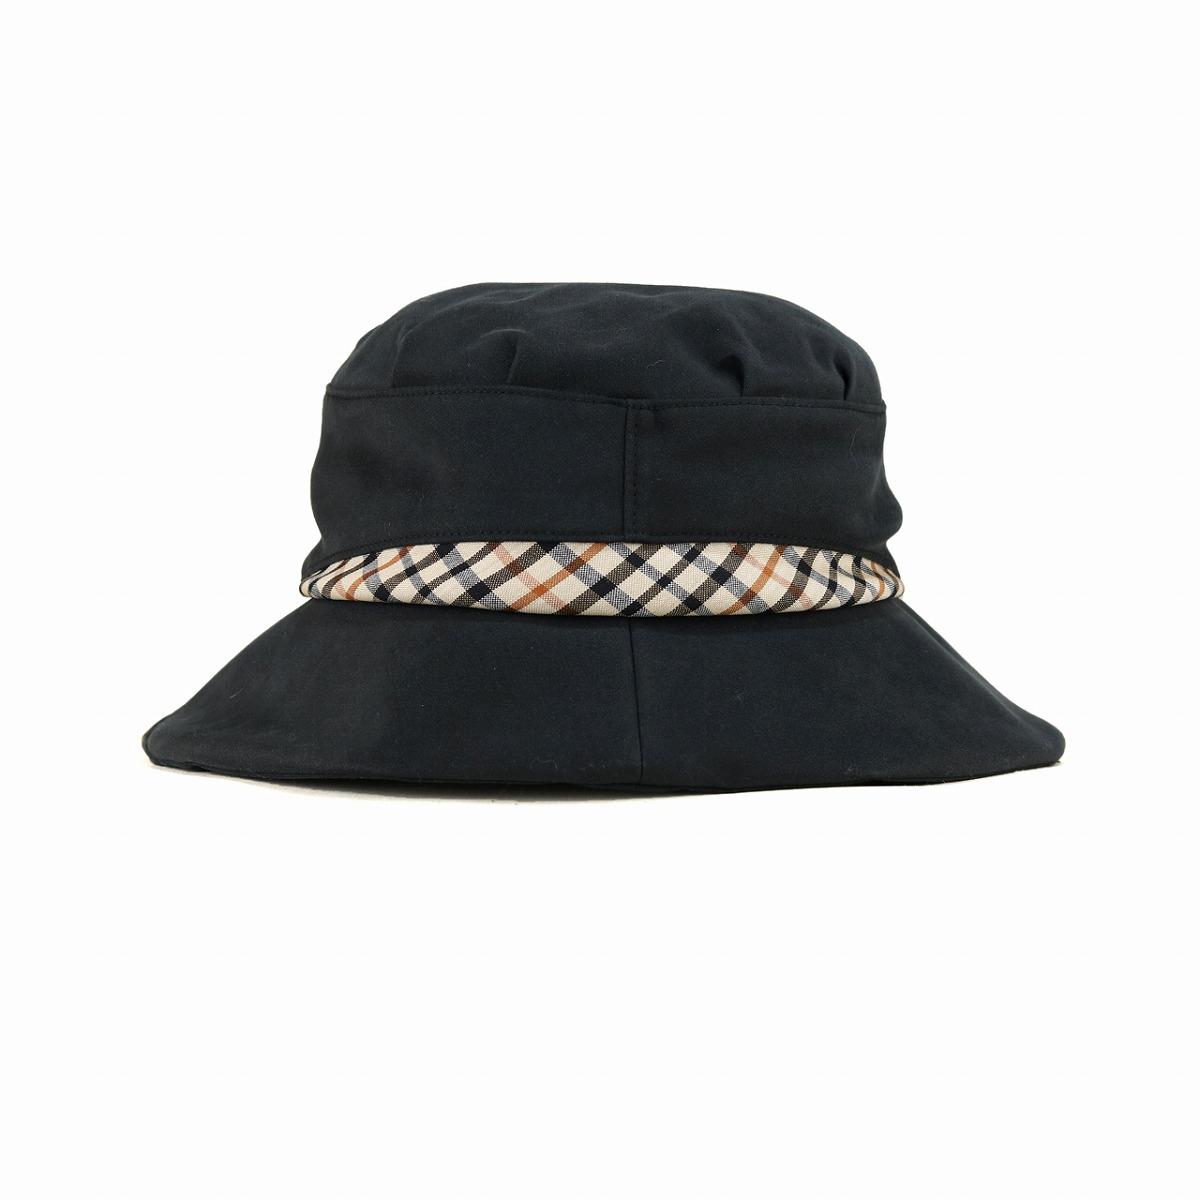 Poplin Ivy Hat by Dorfman Pacific Light Gray